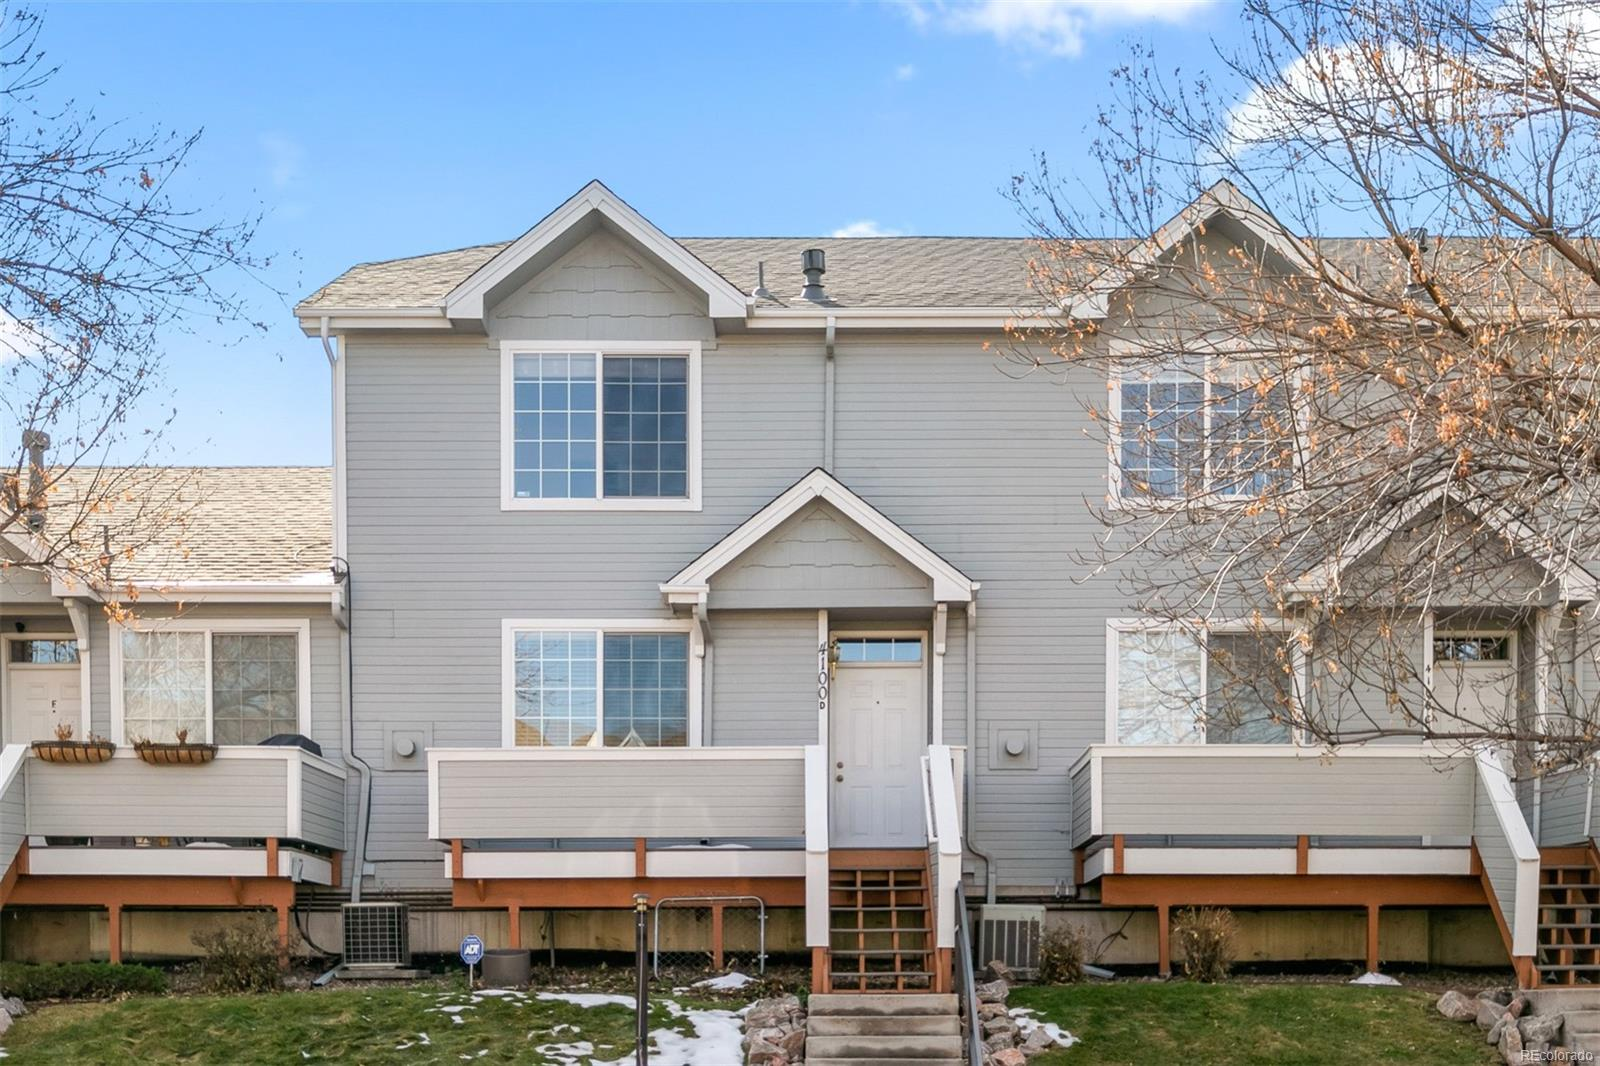 4100 E 119th Place, Thornton, CO 80233 - Thornton, CO real estate listing